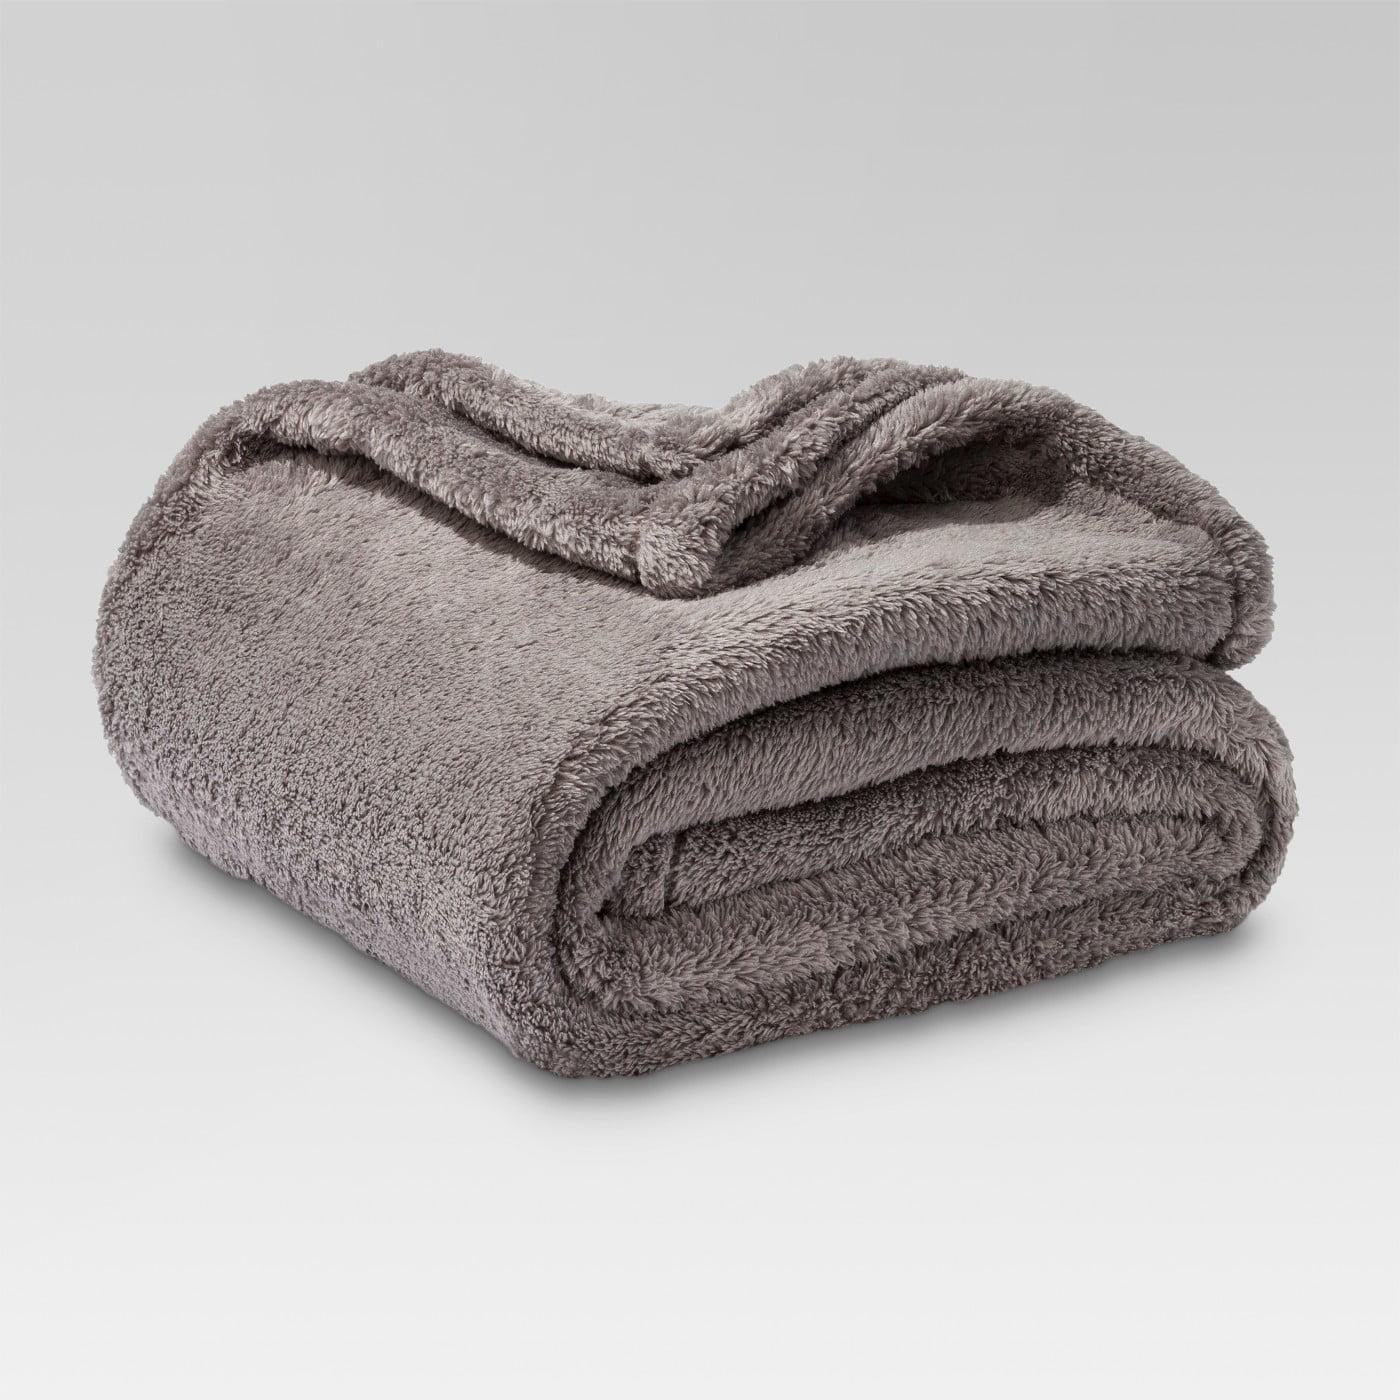 Threshold Fuzzy Blanket Throw Gray 70 X 50 New Walmart Com Walmart Com